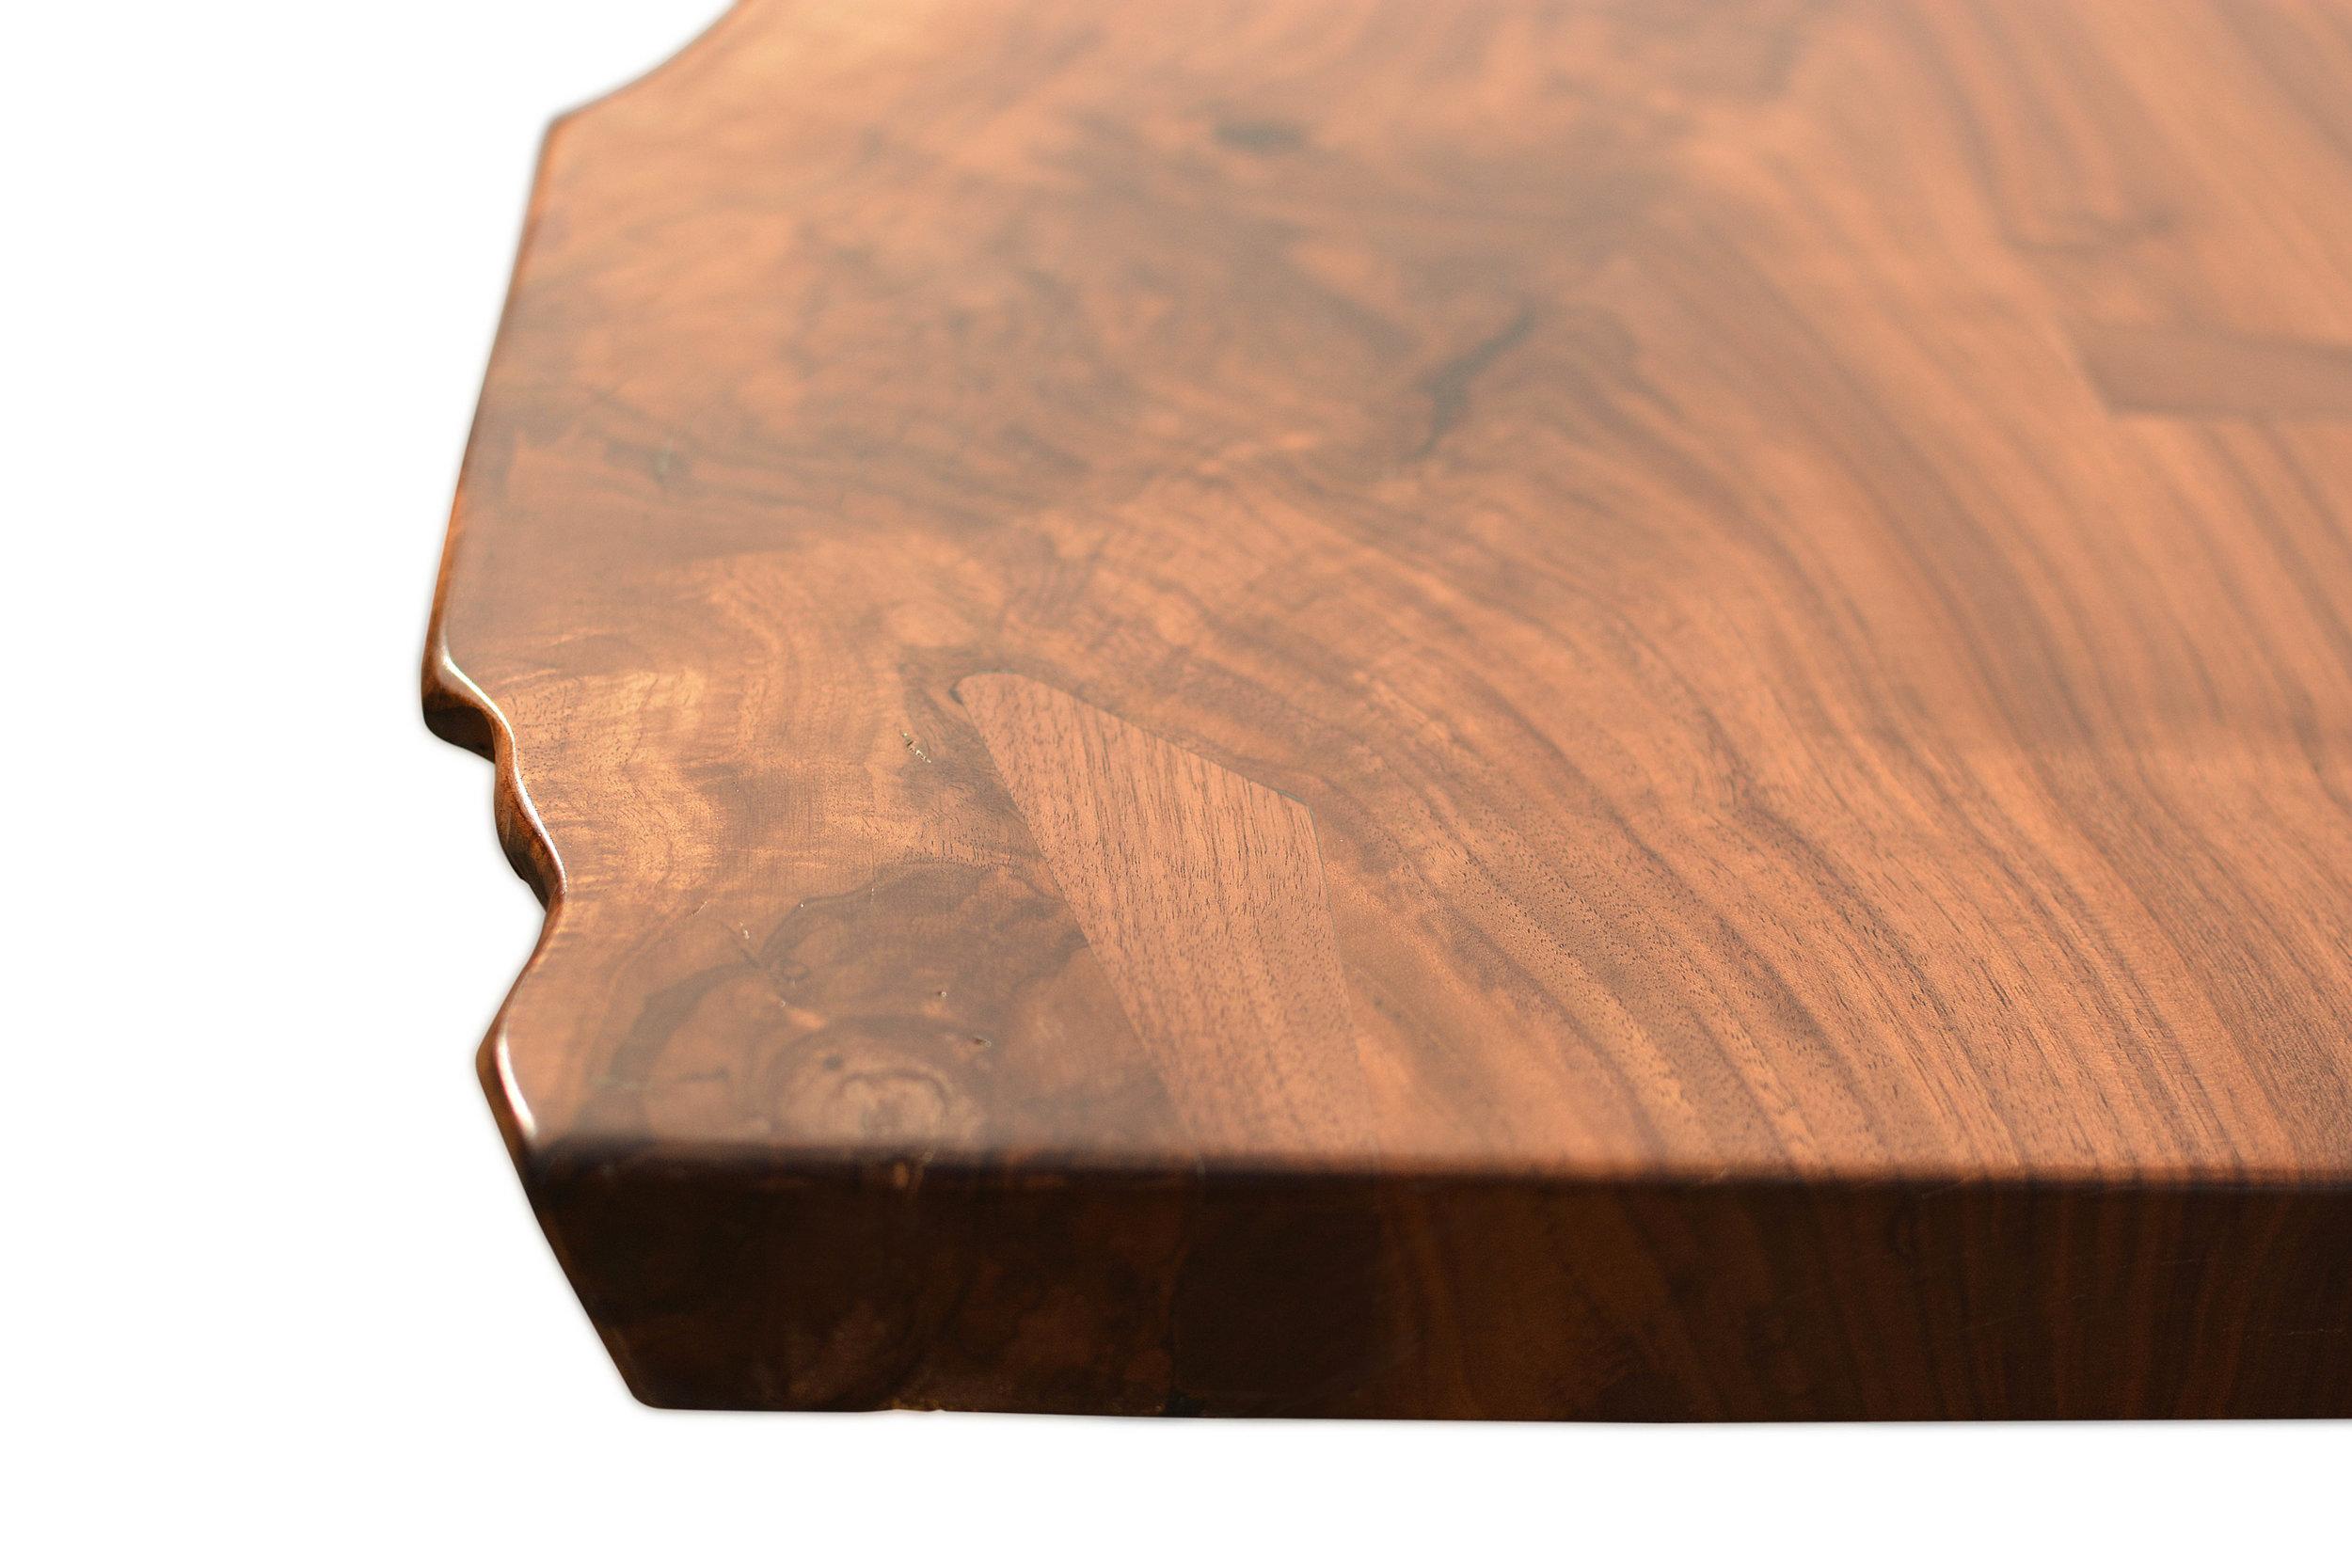 Etz & Steel Hermes Live Edge Walnut Table Close Up 9.JPG